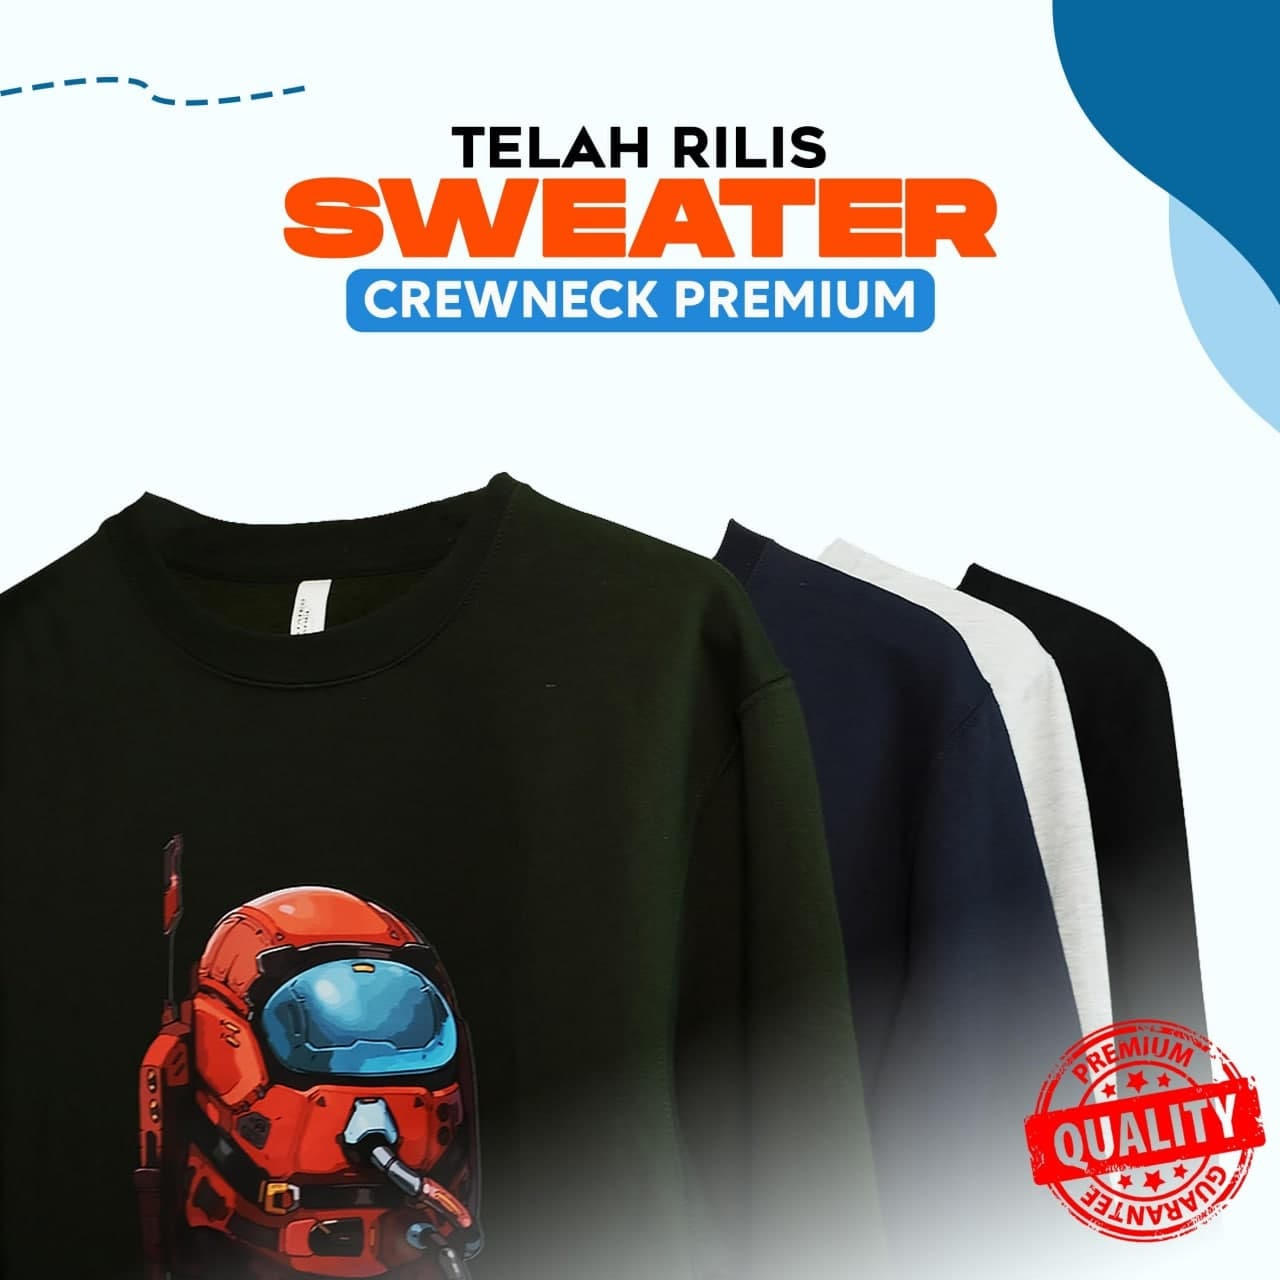 Costom Sweater Crewneck Premium